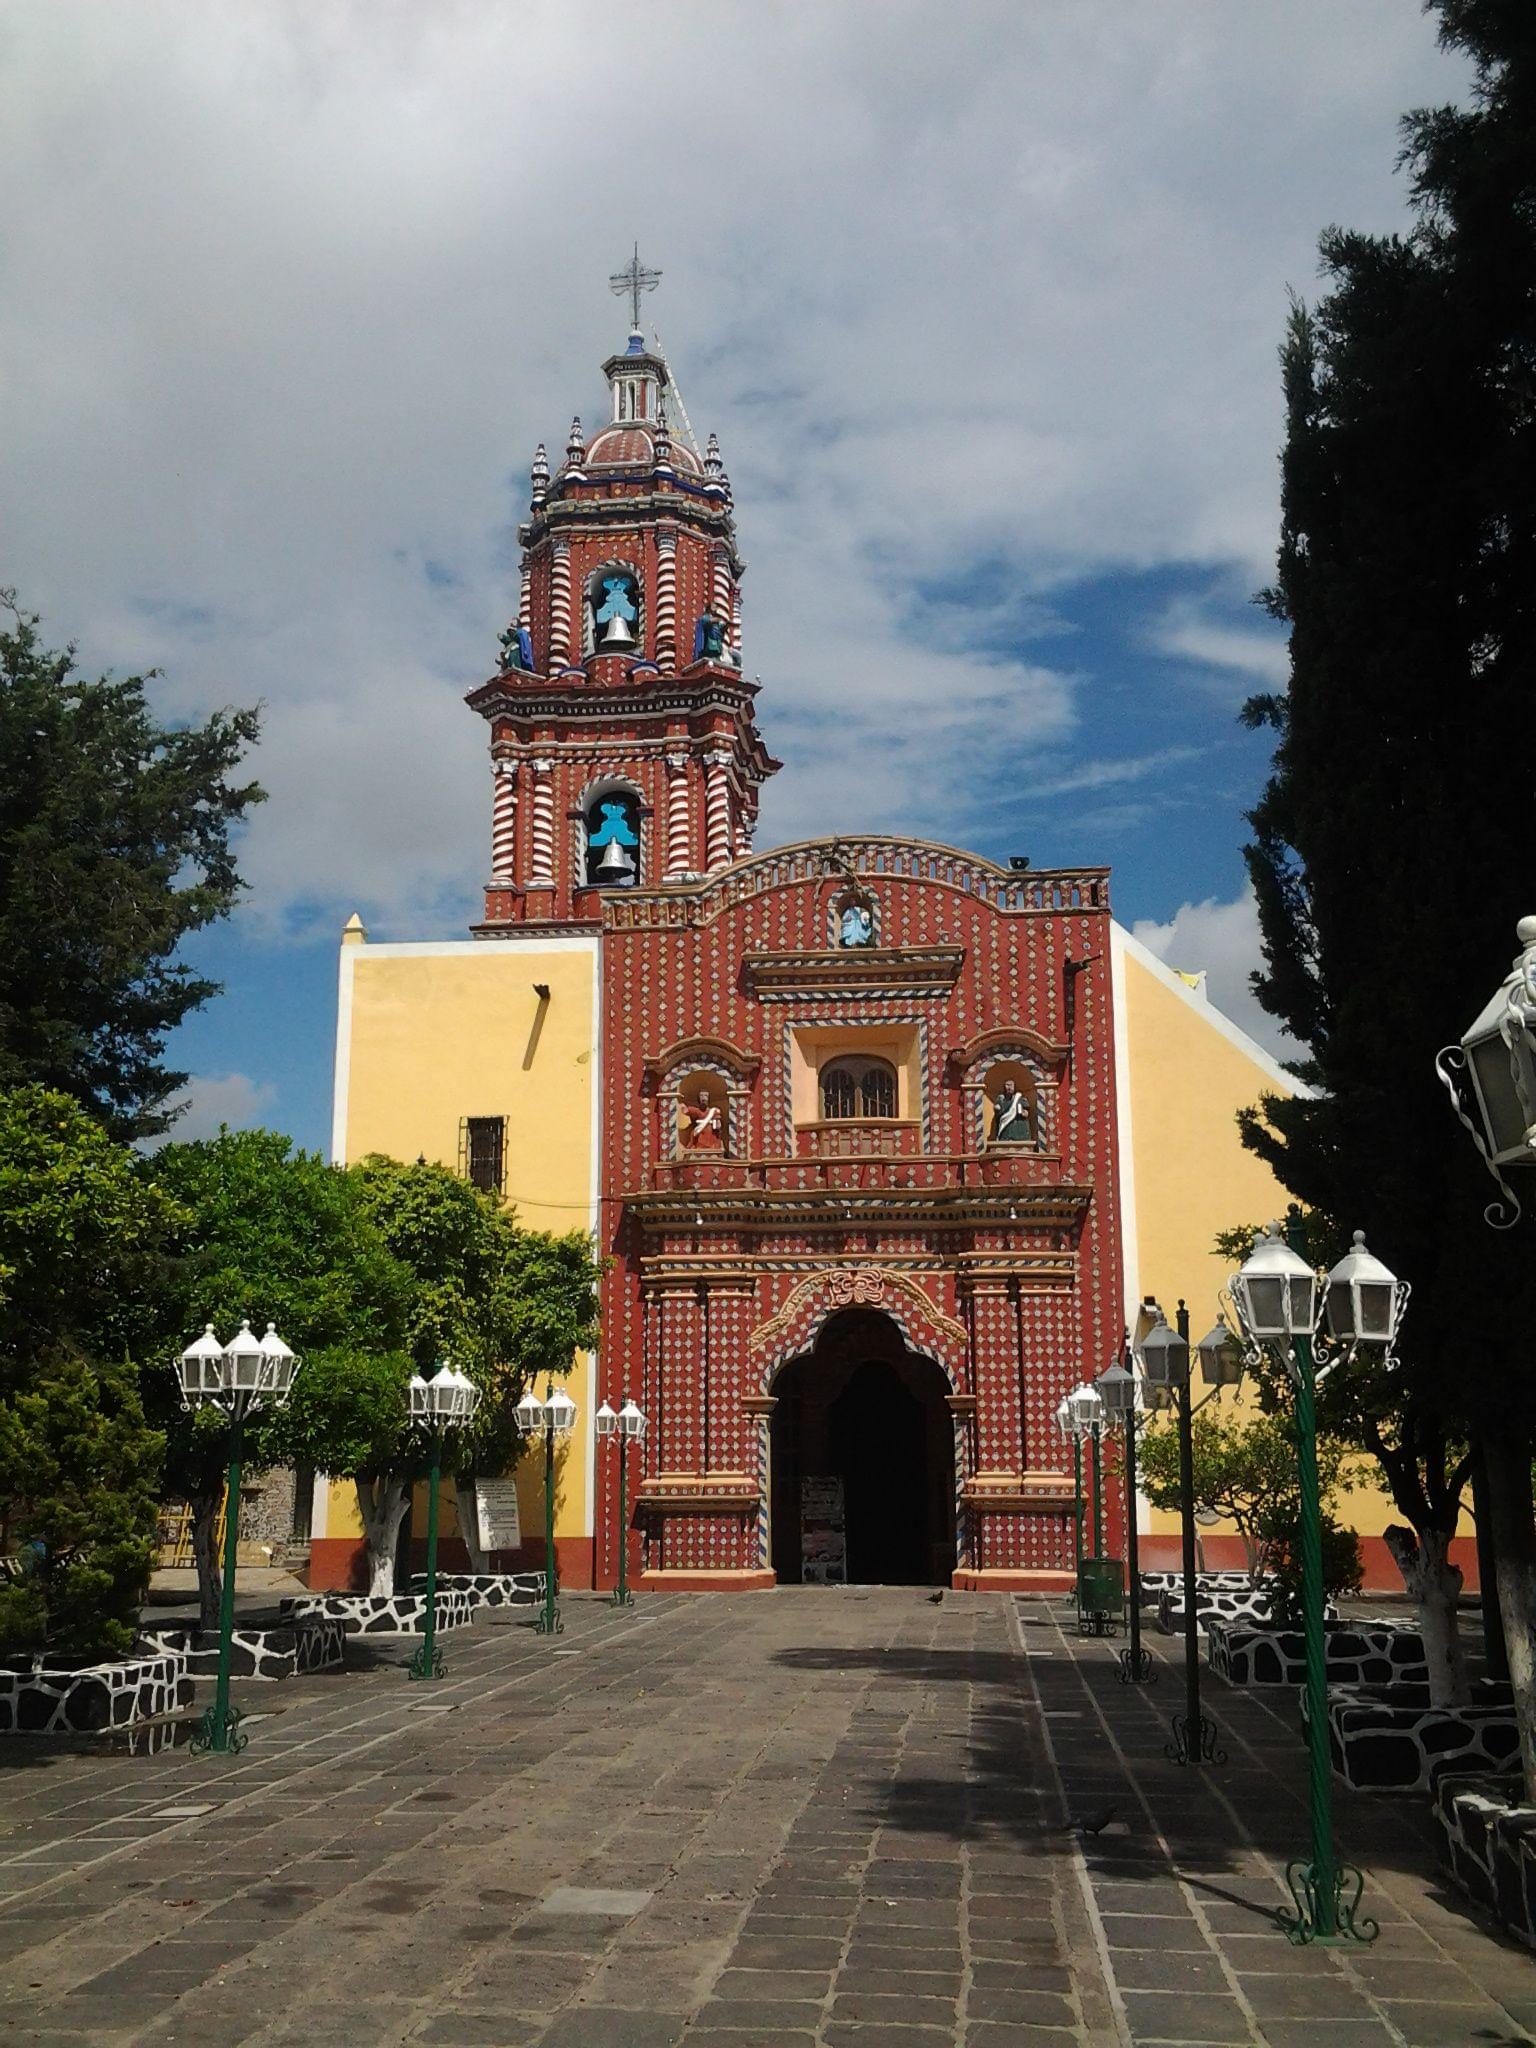 La fachada de talavera de la iglesia de Tonanzintla en el Estado de Puebla, México. Foto por Laila Hynninen